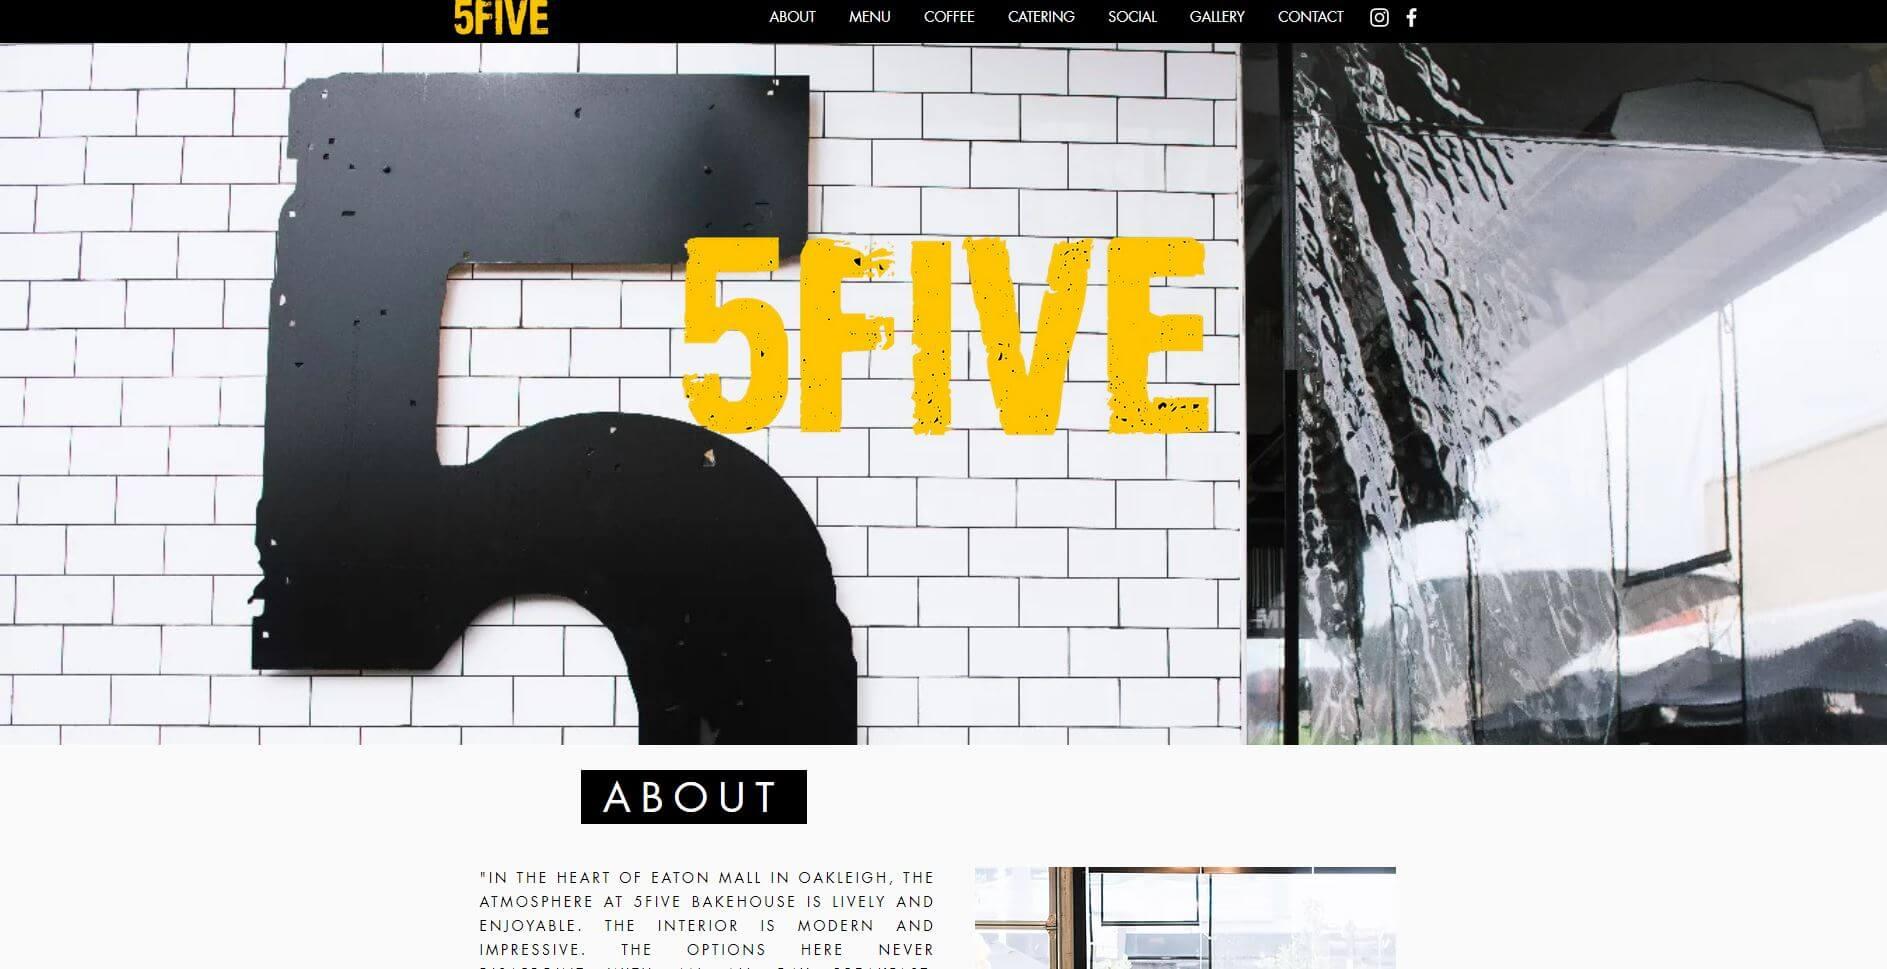 5five Cafe